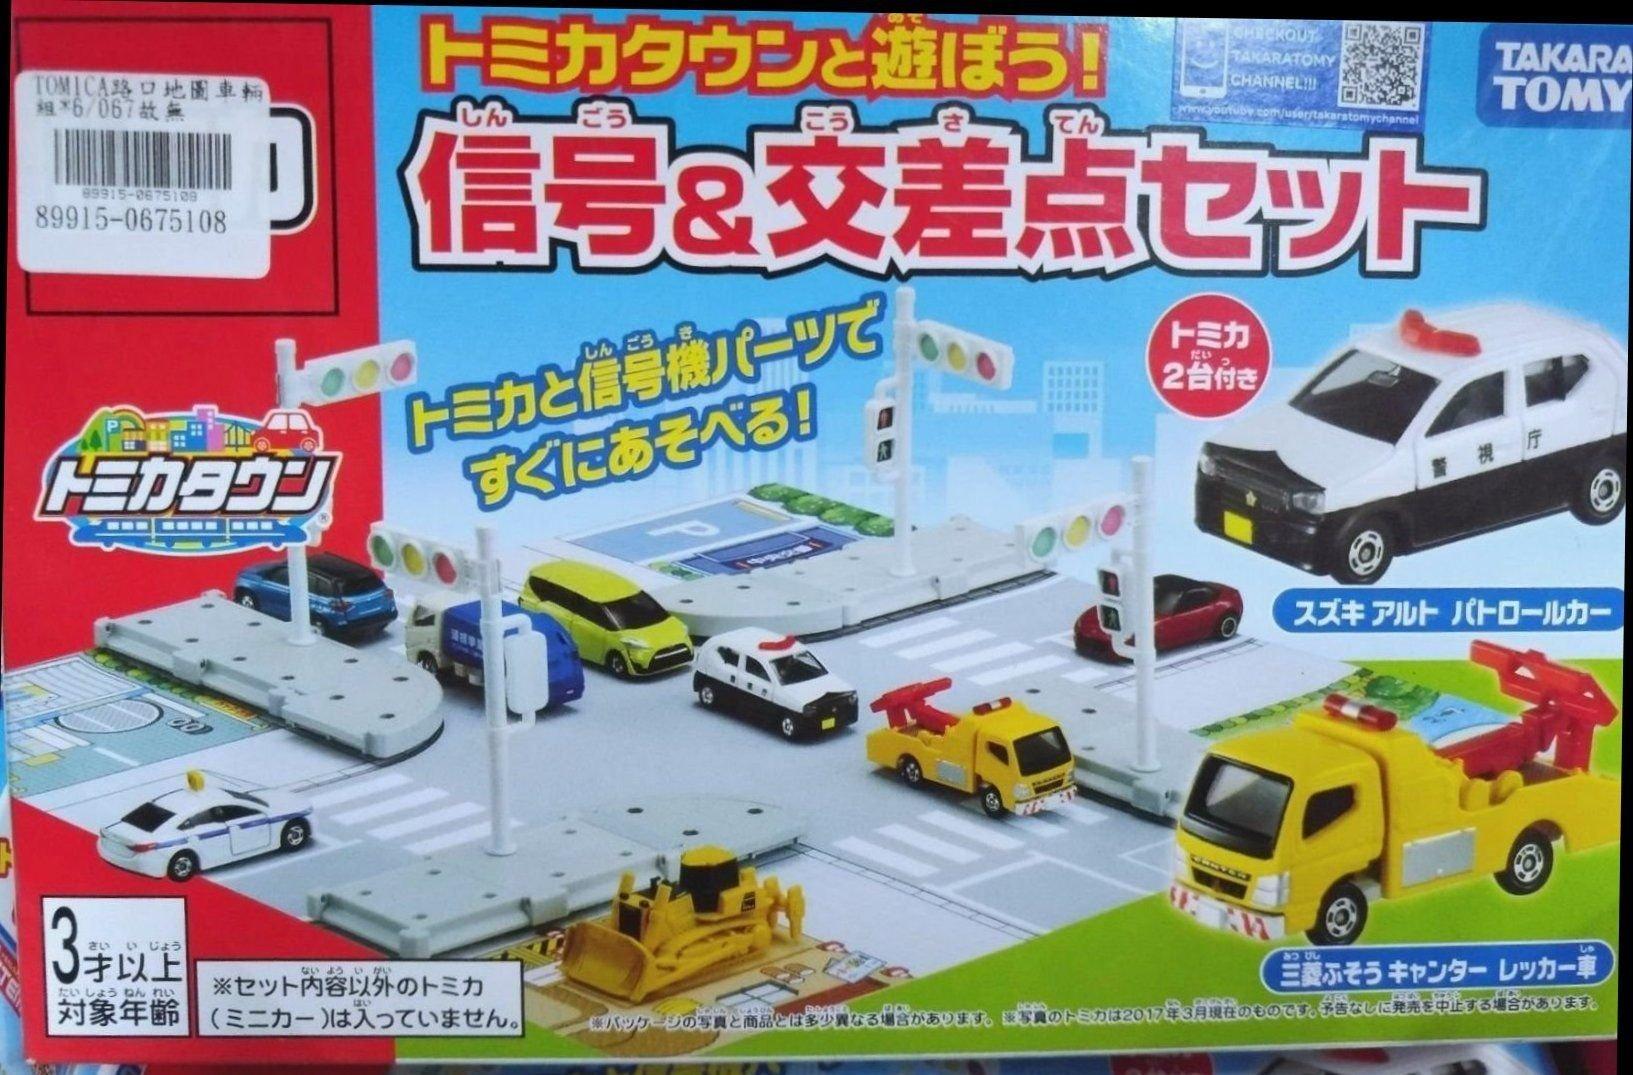 TAKARA TOMY TOMICA多美小汽車 路口地圖車輛組 【親子世界】